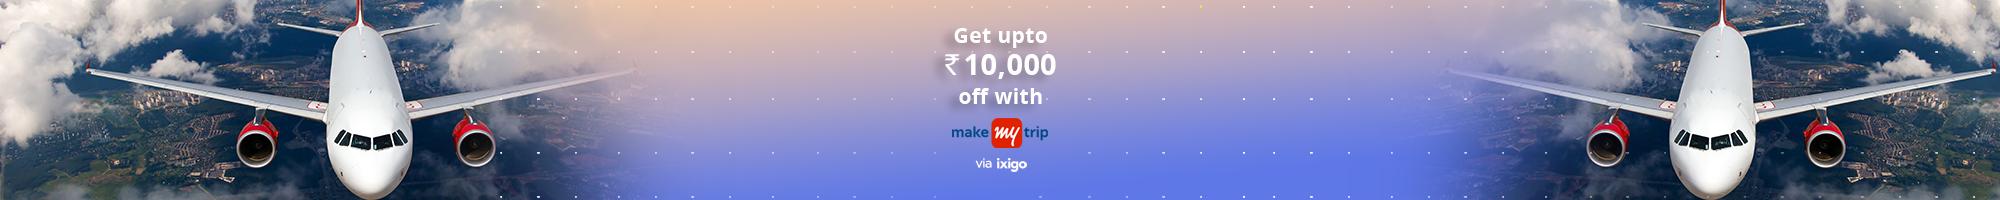 ixigo Flight Offers - Domestic Flight Booking Offers & International